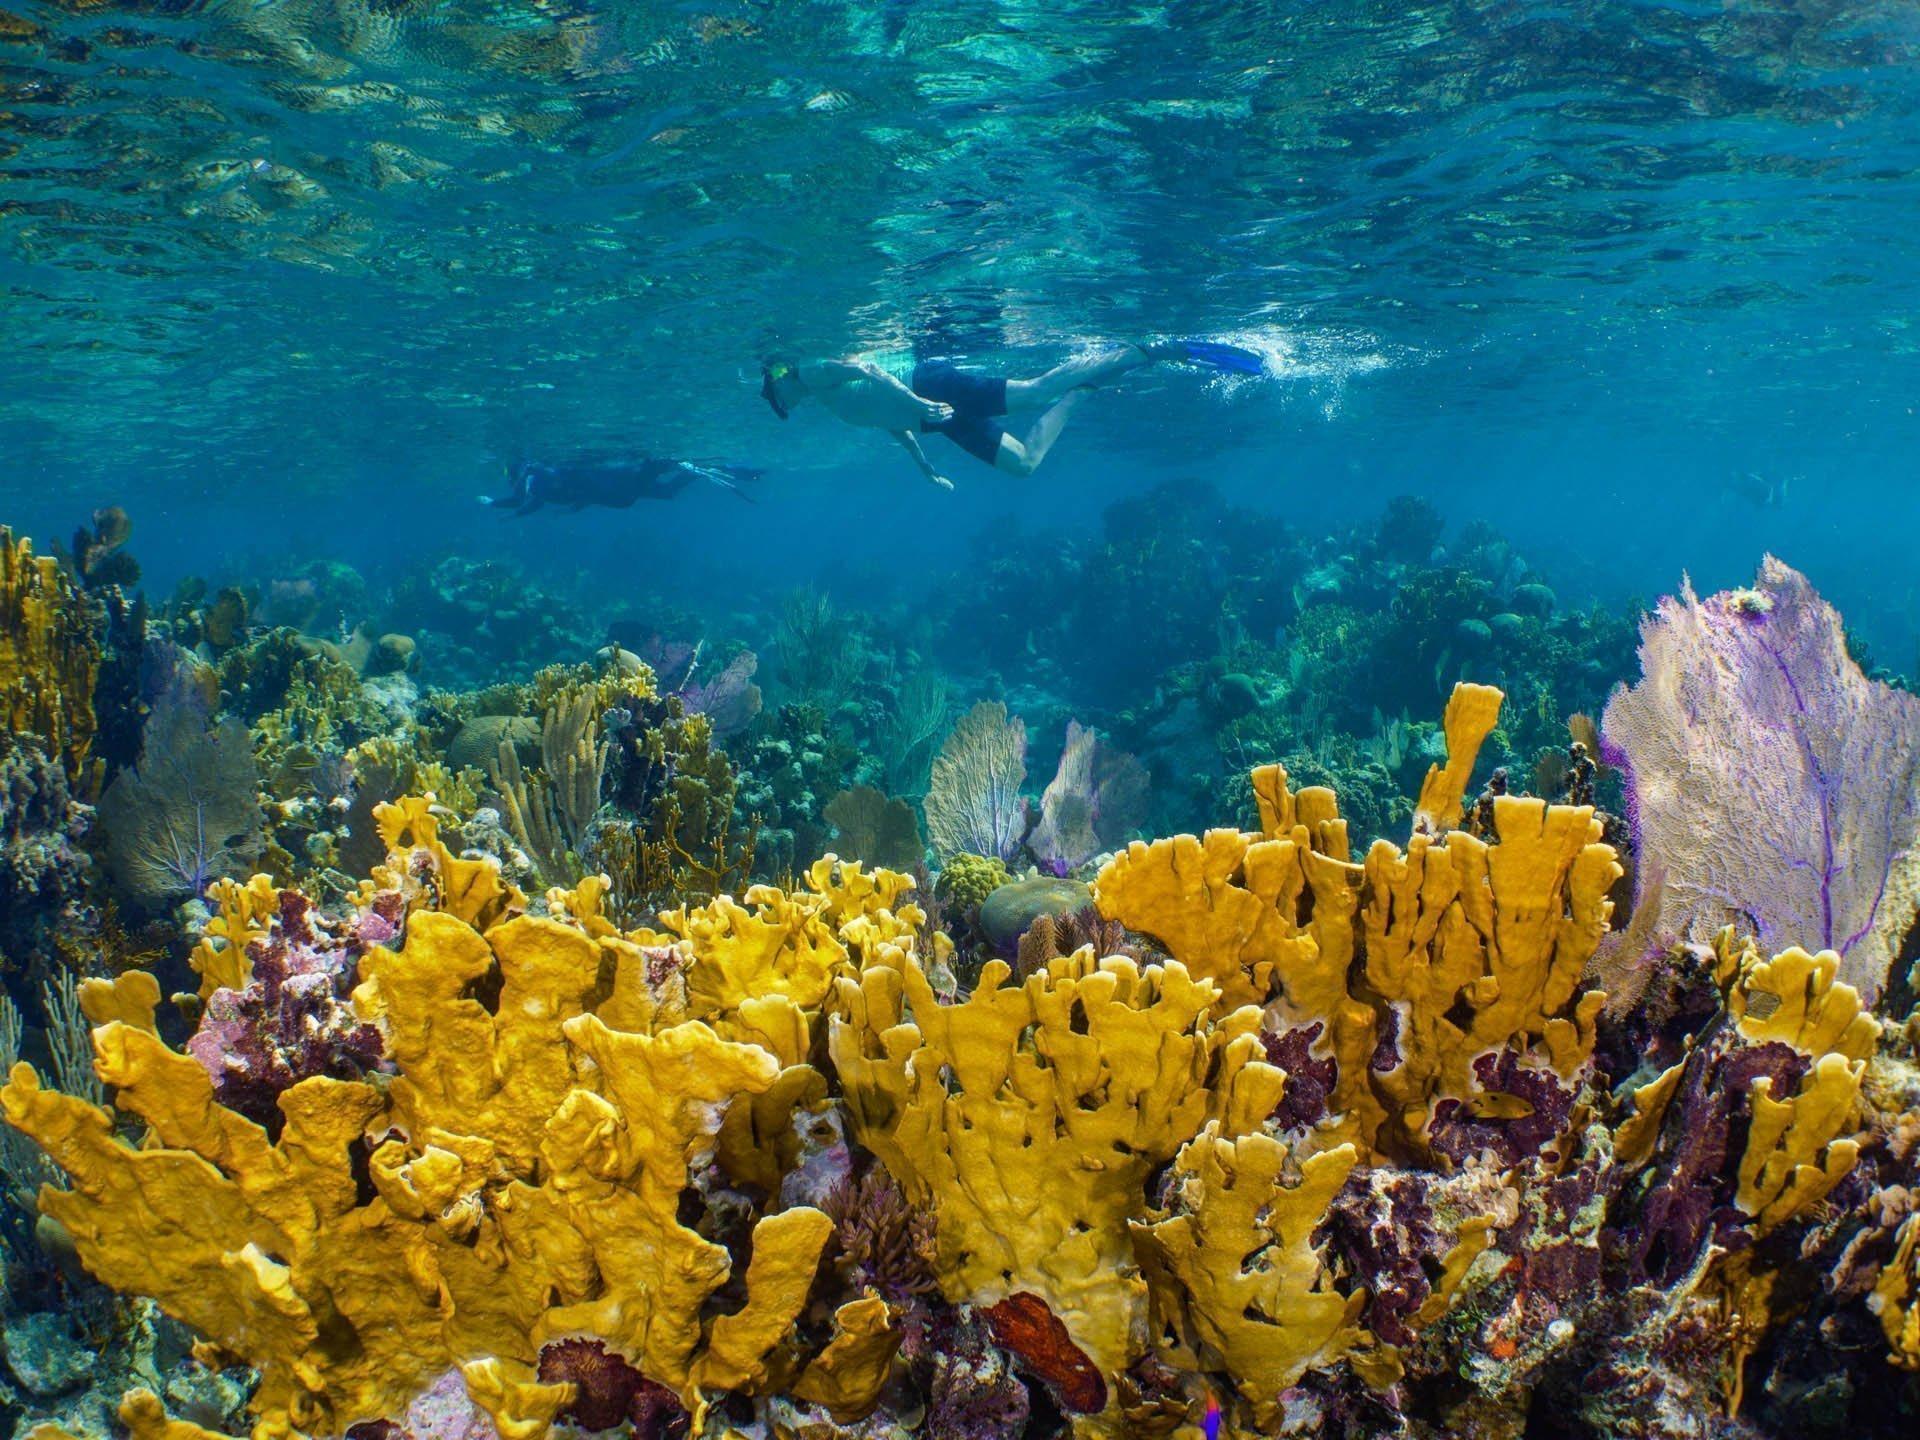 Snorkelers cruising over coral reef